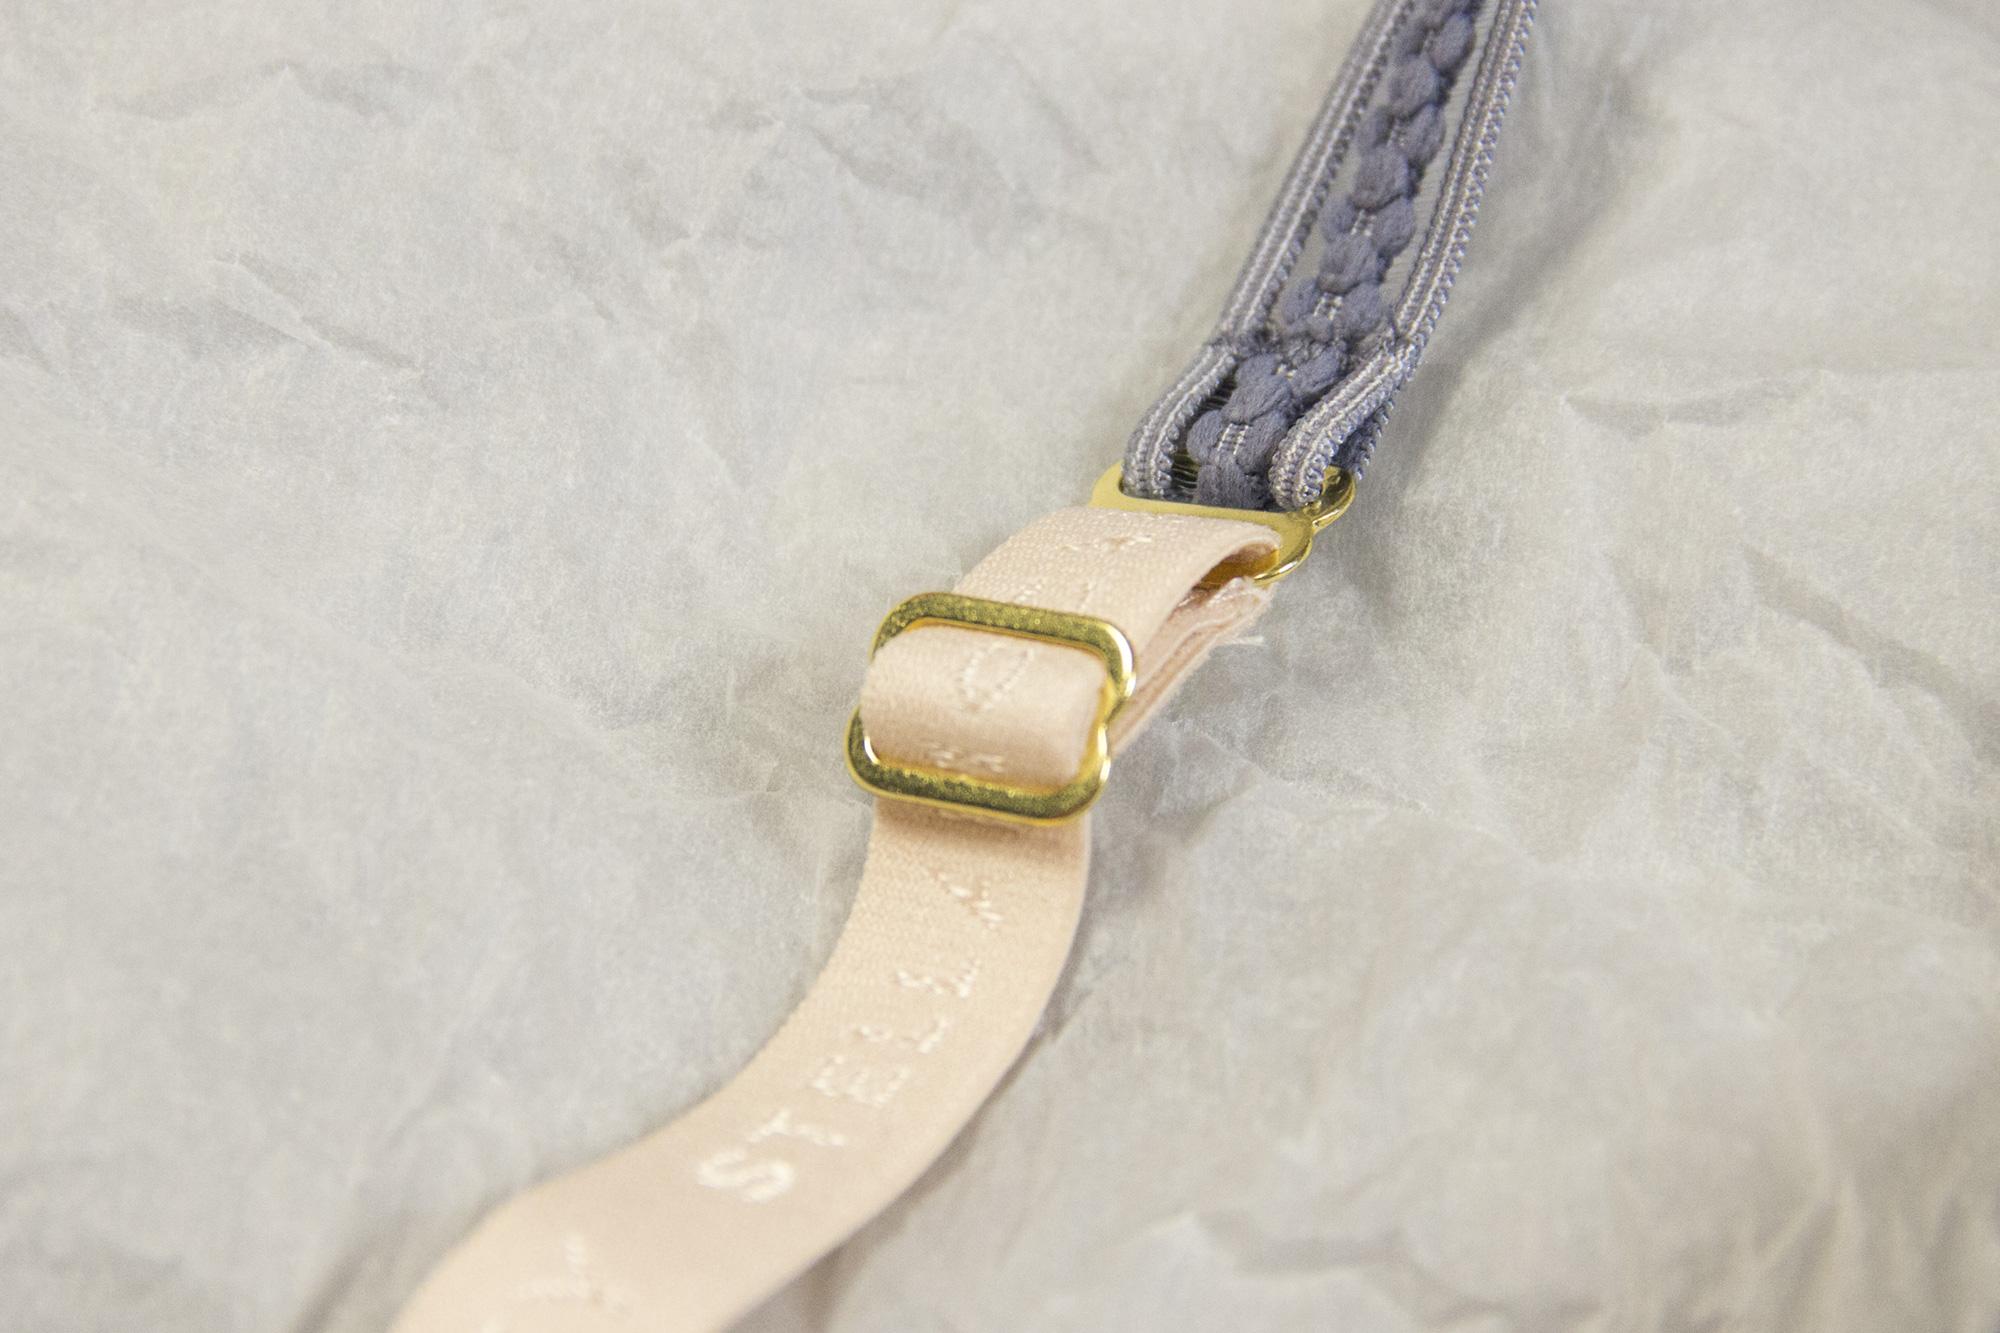 Нижнее бельё для русалки: Обзор комплекта Cherie Sneezing от Stella McCartney на garterblog.ru